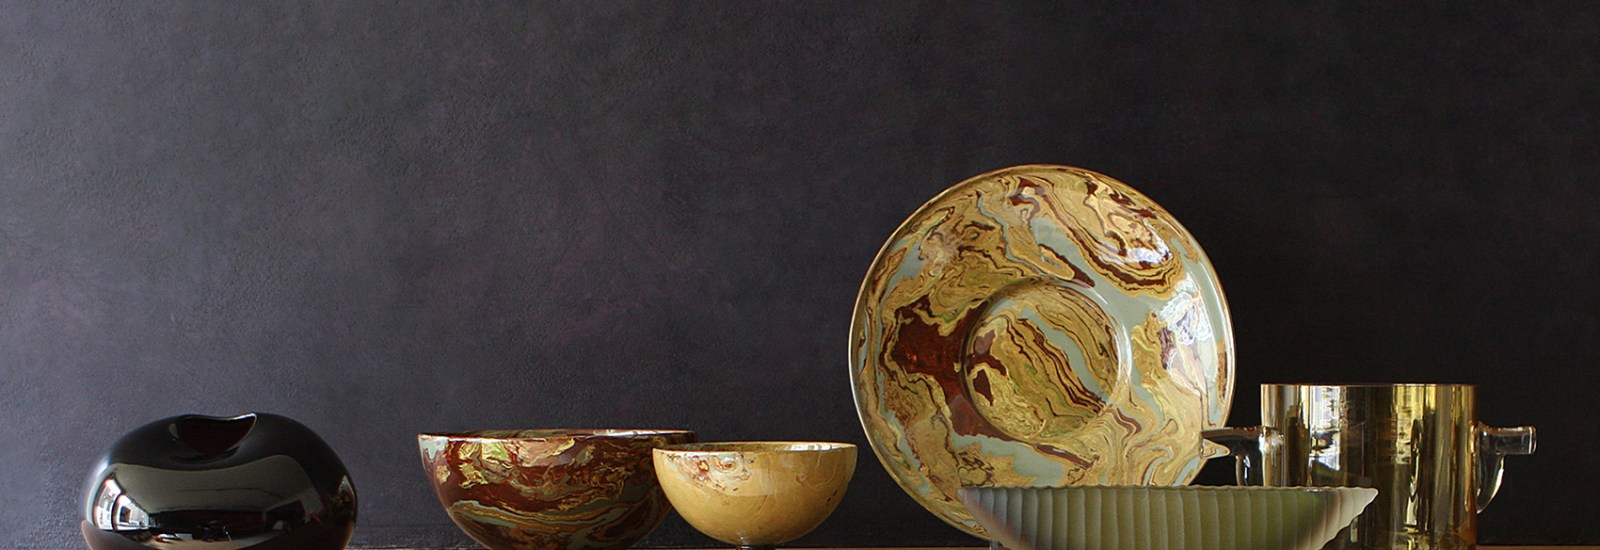 Rebecca Willer tableware